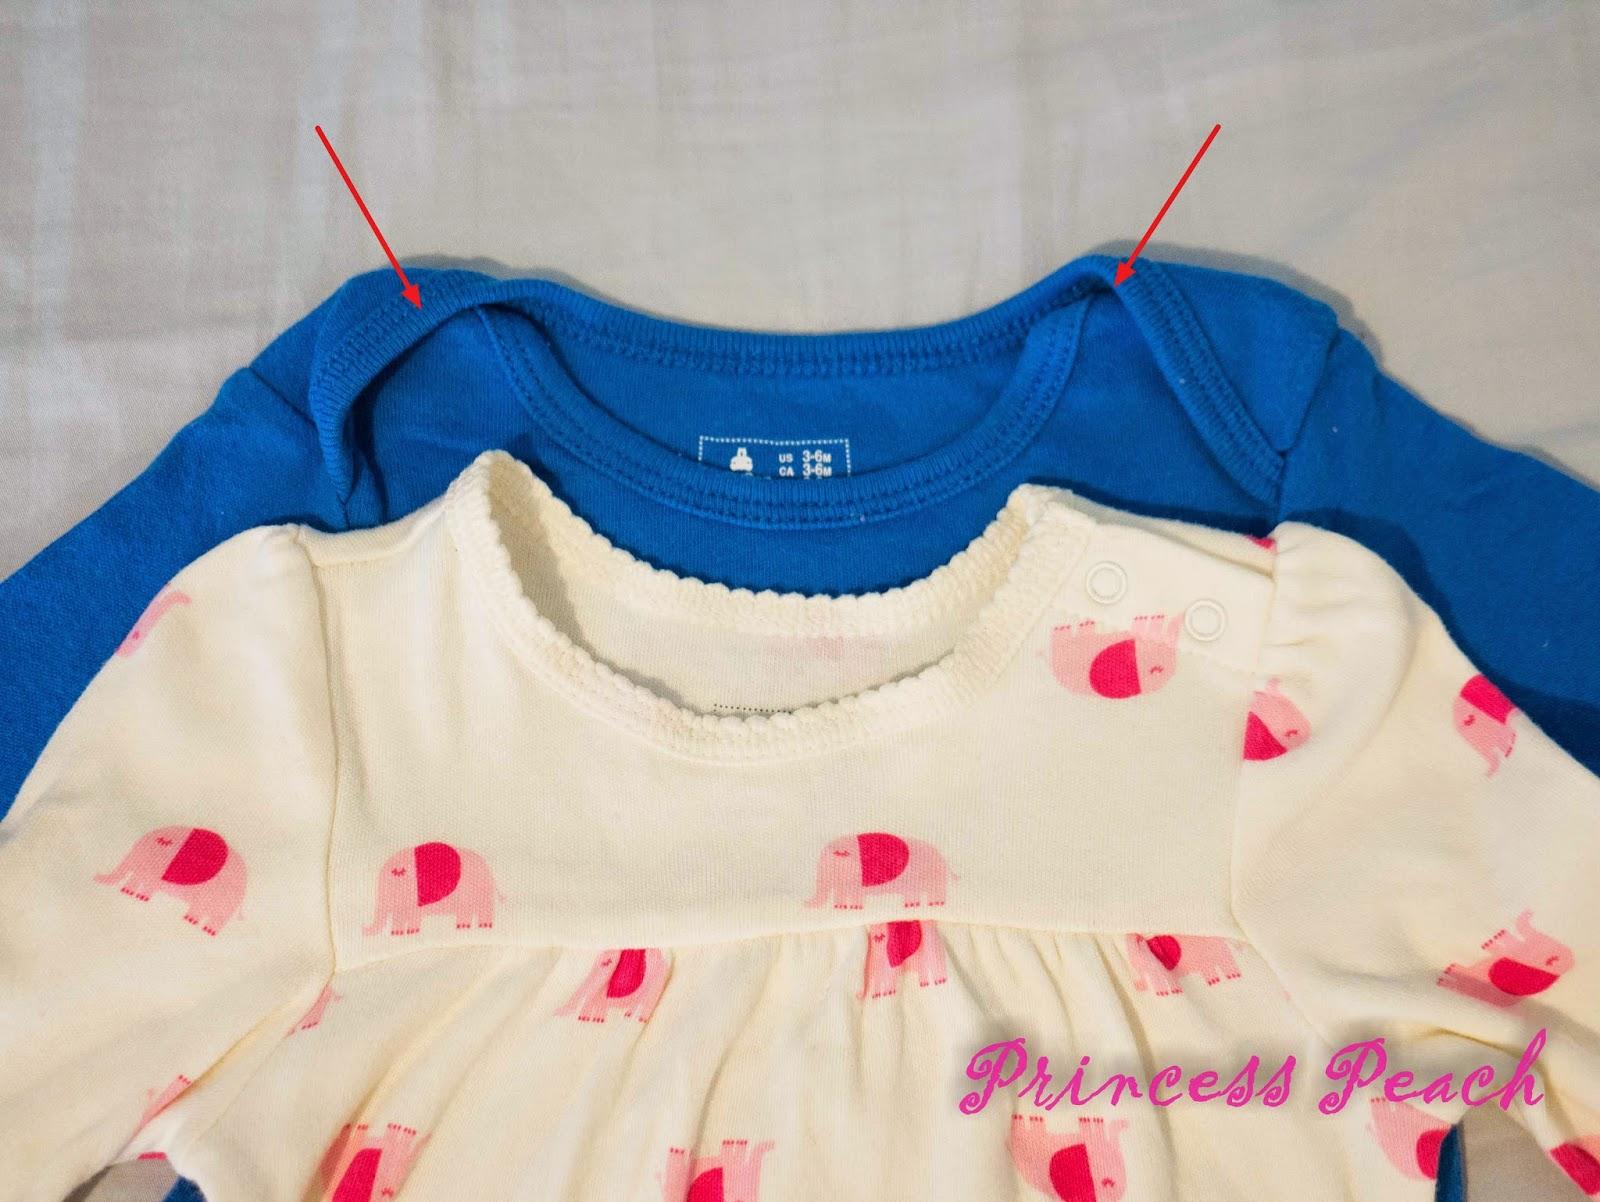 http://twpeach.blogspot.com/2015/03/baby-clothes.html